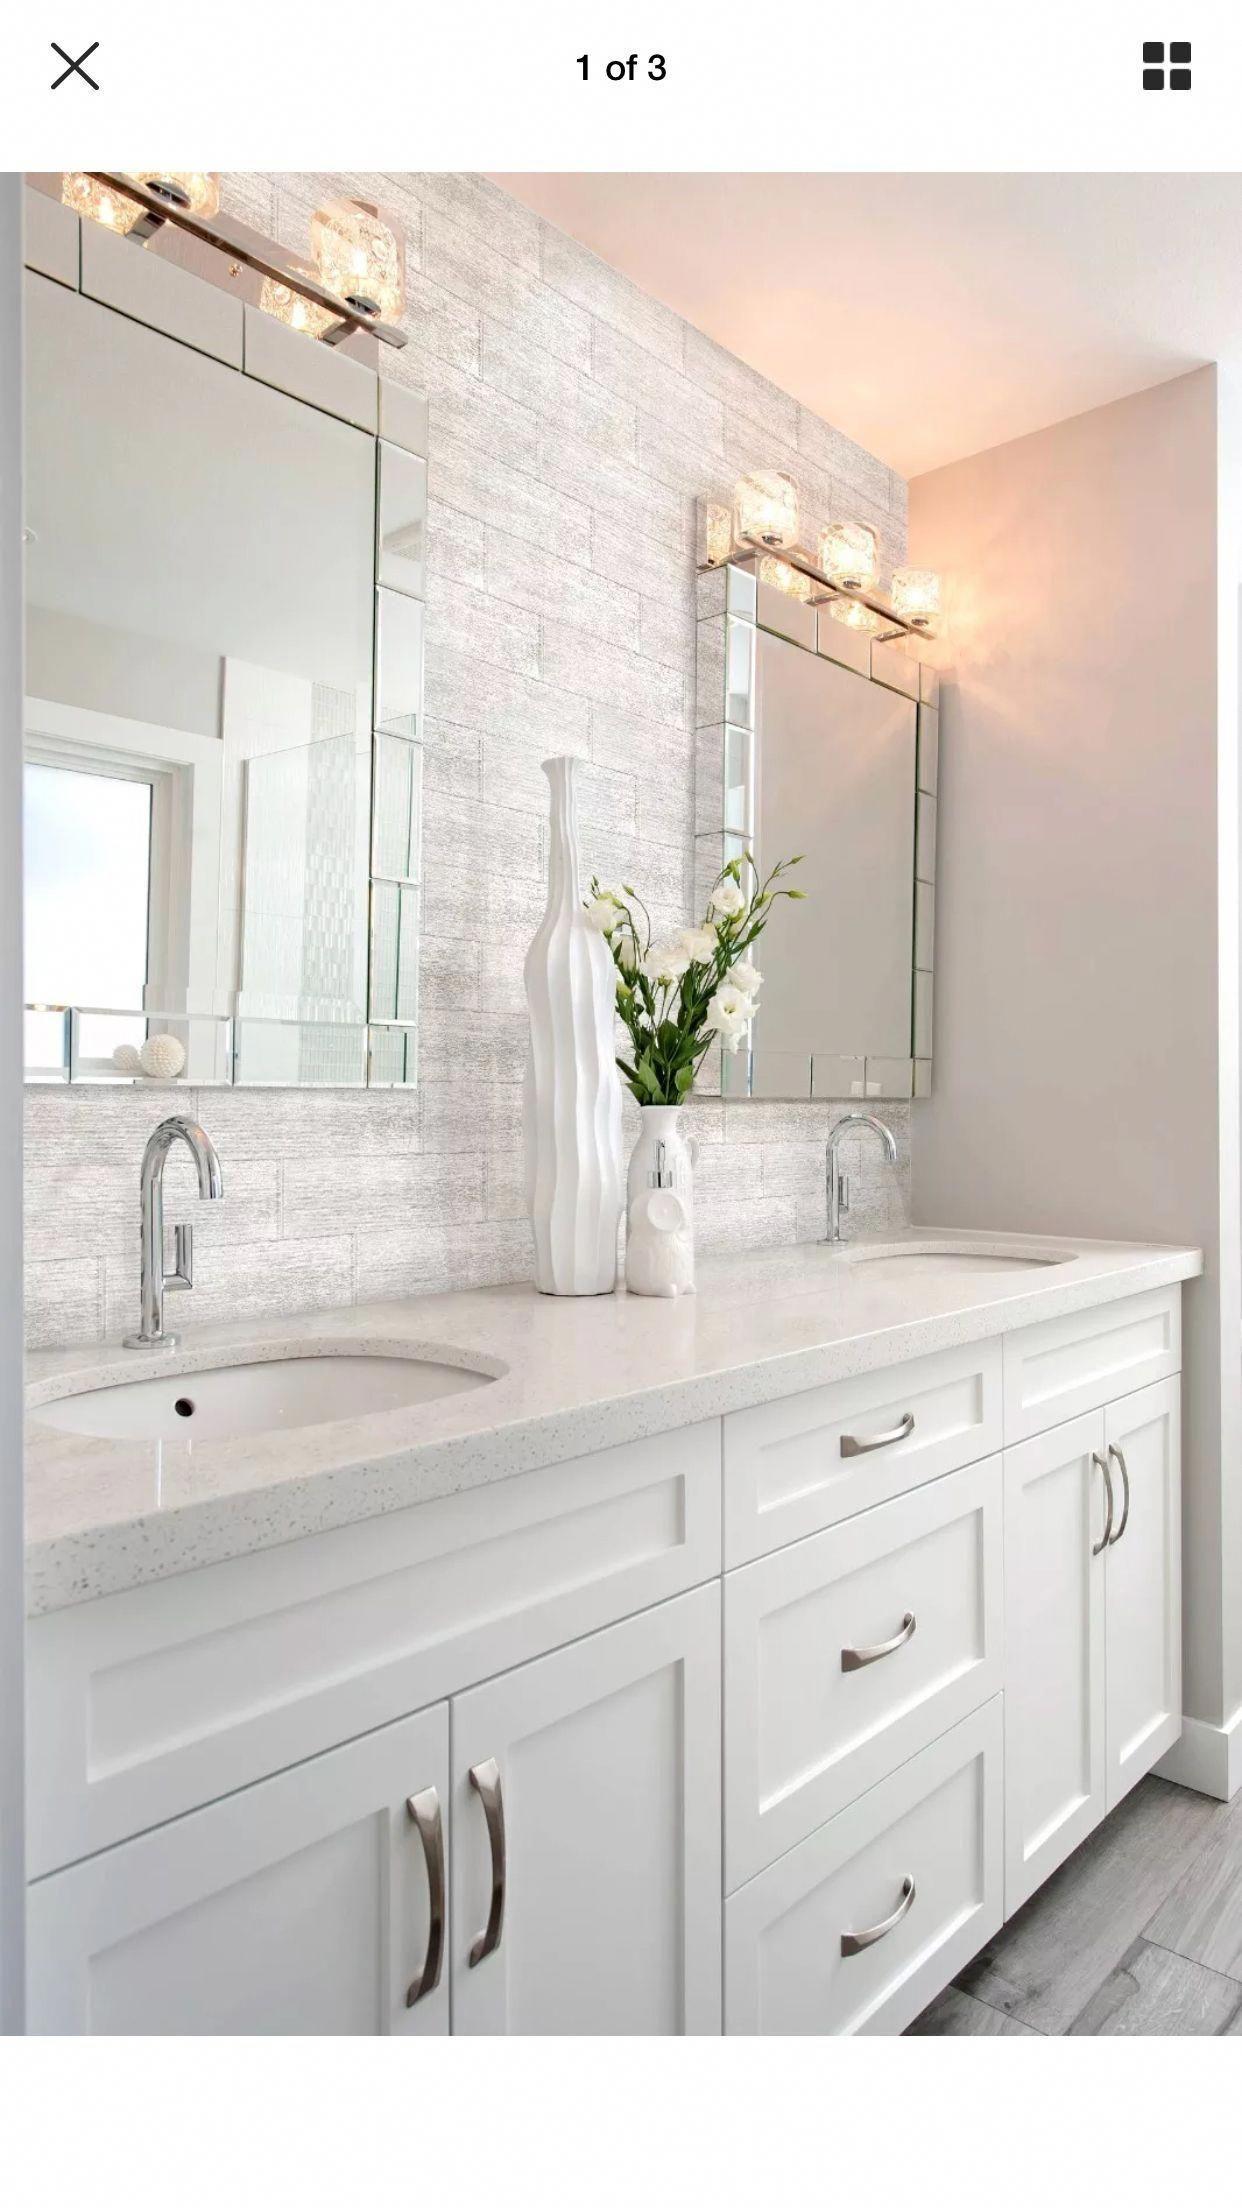 High Quality Bathroom Vanities Doublesinkbathroomvanity Double